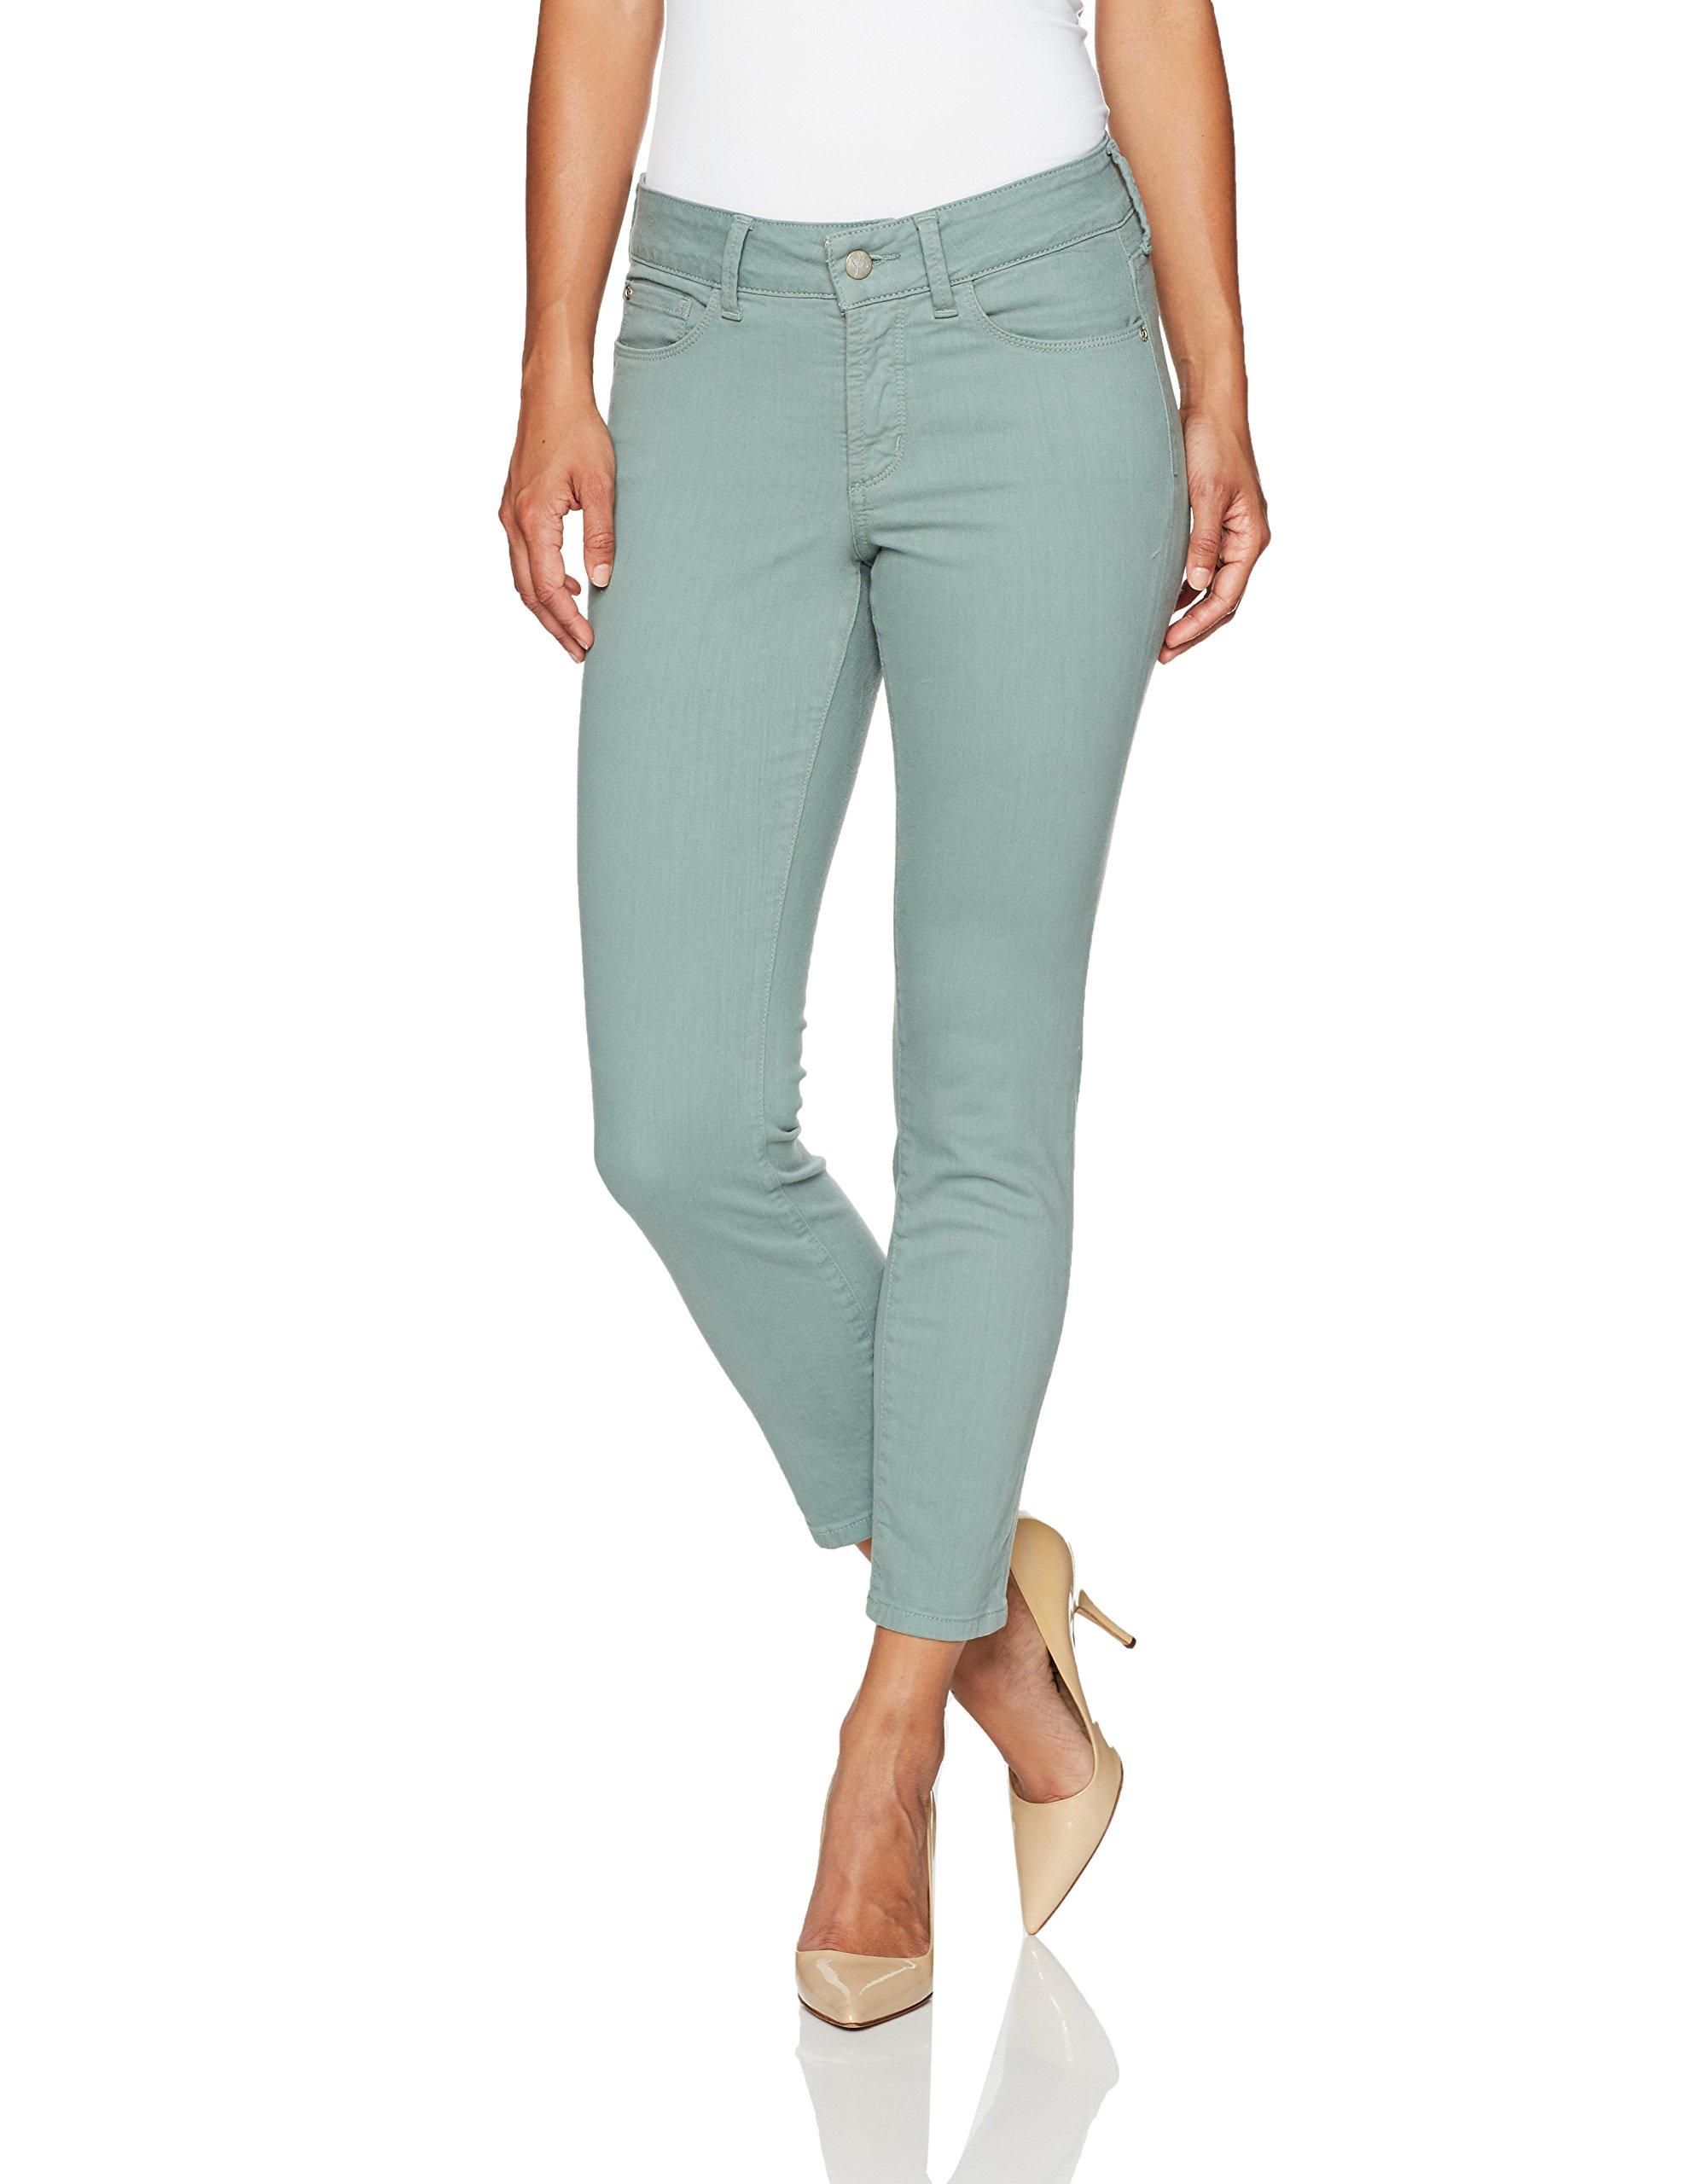 NYDJ Women's Petite Size Alina Skinny Convertible Ankle Jeans, Calypso, 14P